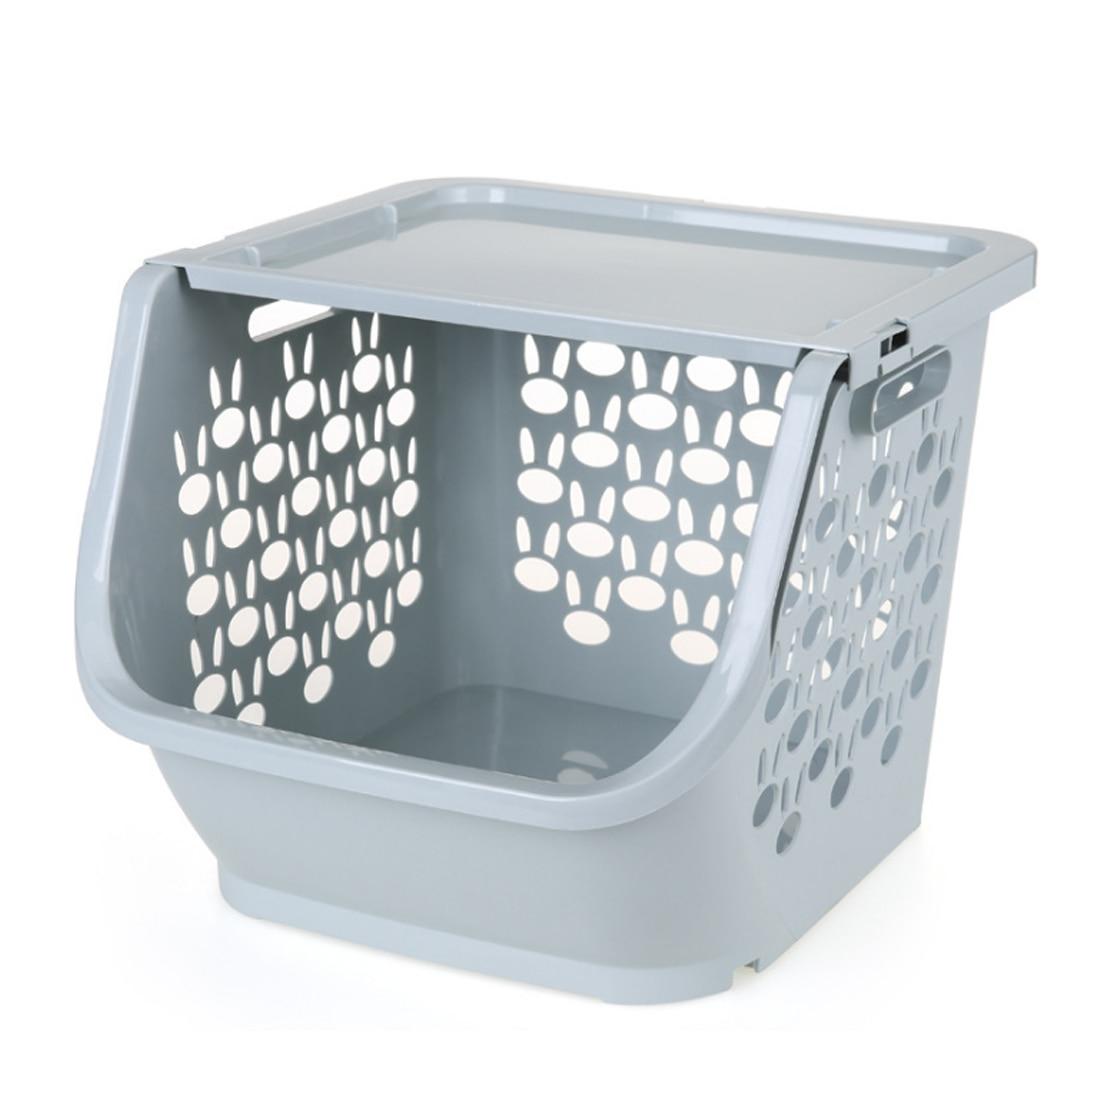 Canasta de plástico para almacenamiento de cocina HIPSTEEN, multifuncional, apilable, hueco, de vegetales para cocina, estantes para frutas, cesta, estanterías